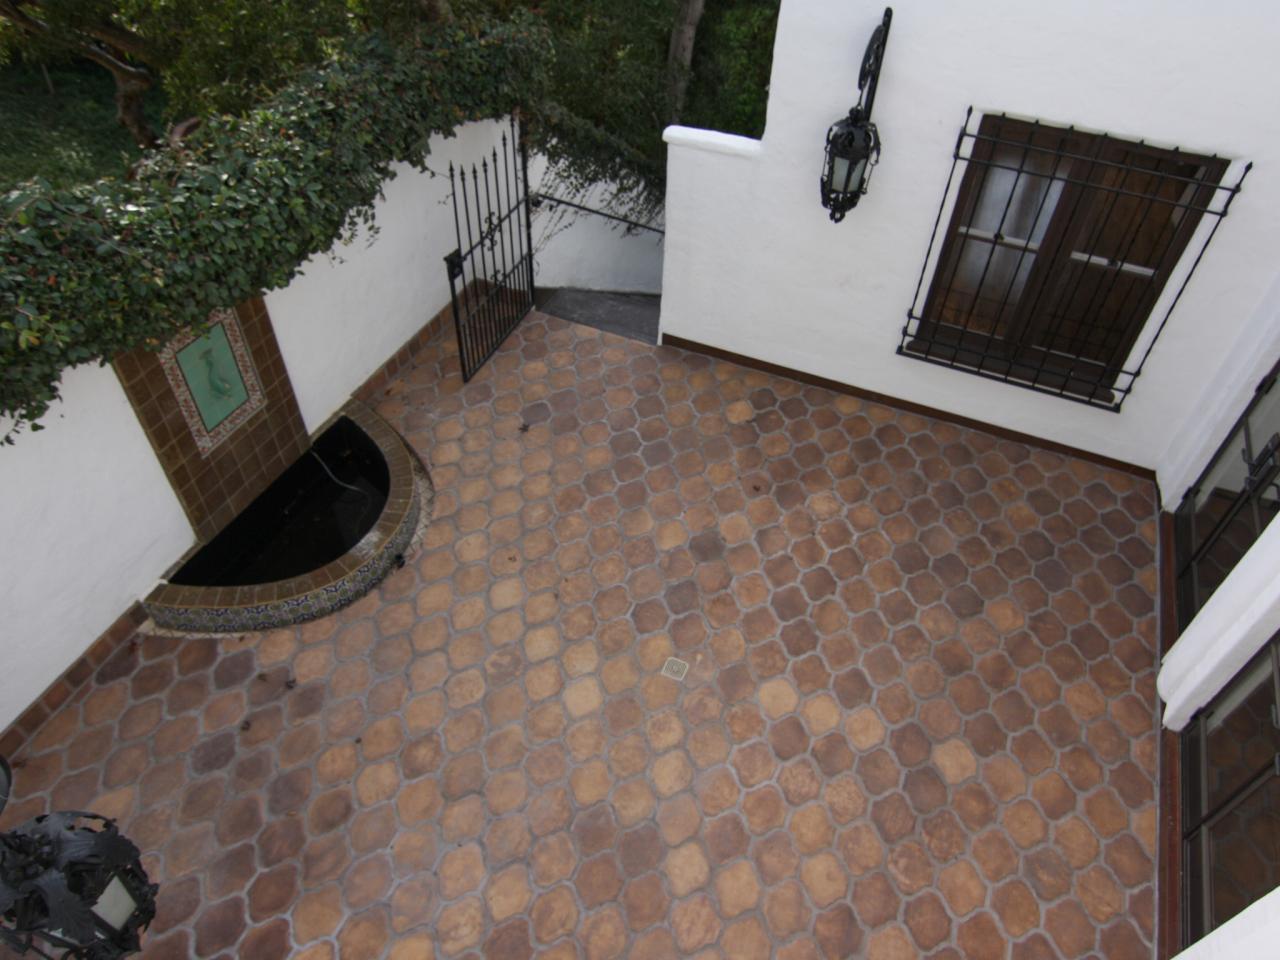 Inspirasi Teras Rumah Cantik Dengan Lantai Marmer Berbagai Motif Surabaya Marmer Surabaya Granit Jual Granit Surabaya Supplier Granit Surabaya Supplier Marmer